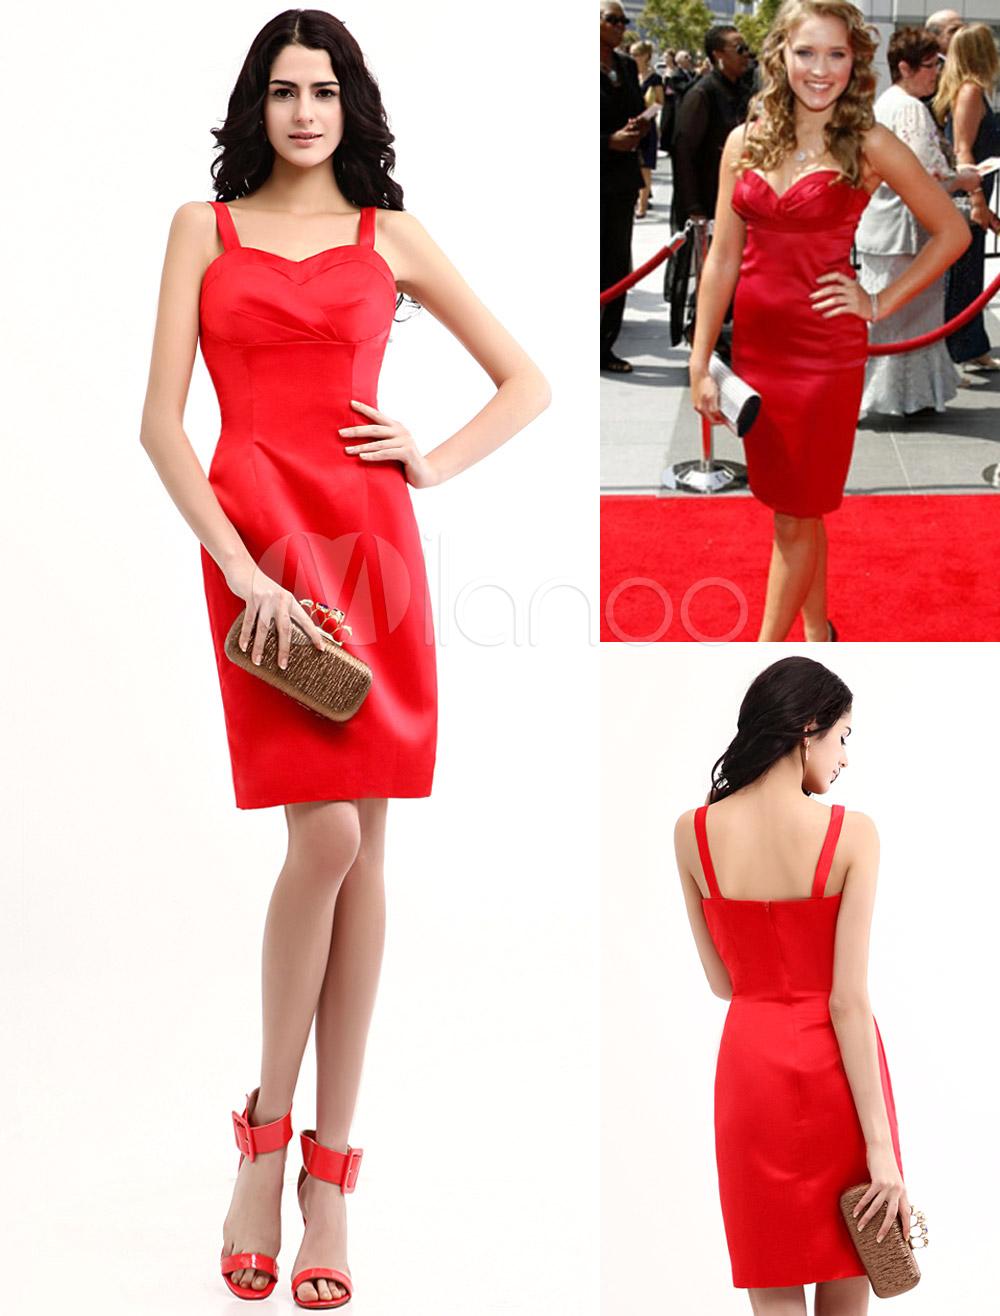 Pretty Red Satin Sweetheart Knee Length Oscar Dress Wedding Guest Dress (Cheap Party Dress) photo